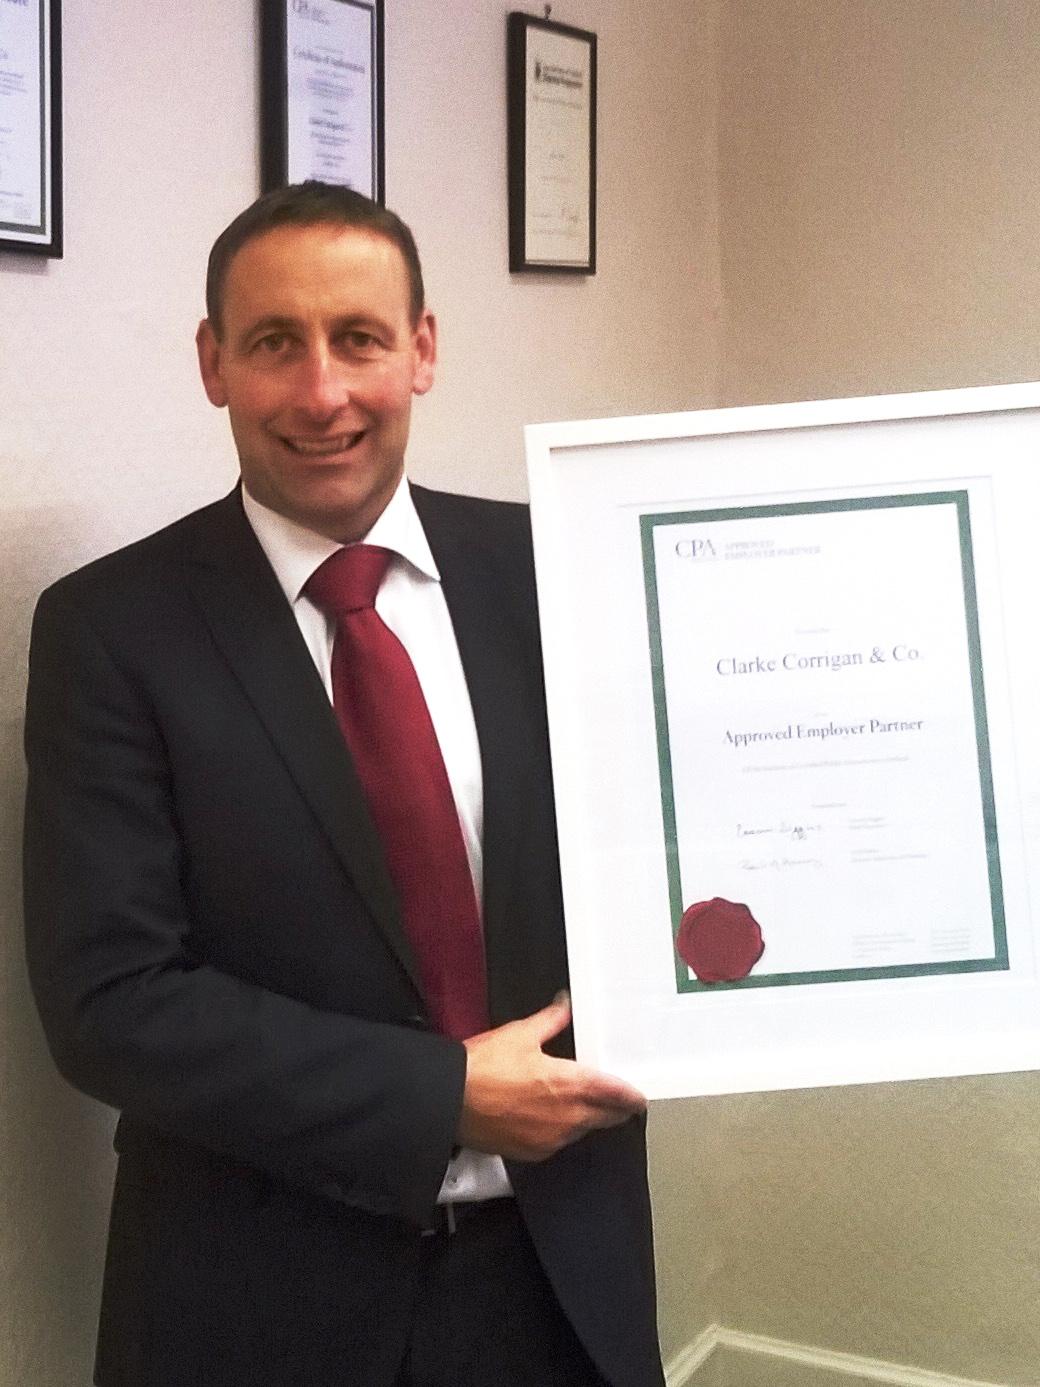 Barry Clark Clarke Corrigan receiving CPA Approved Employer Certificate